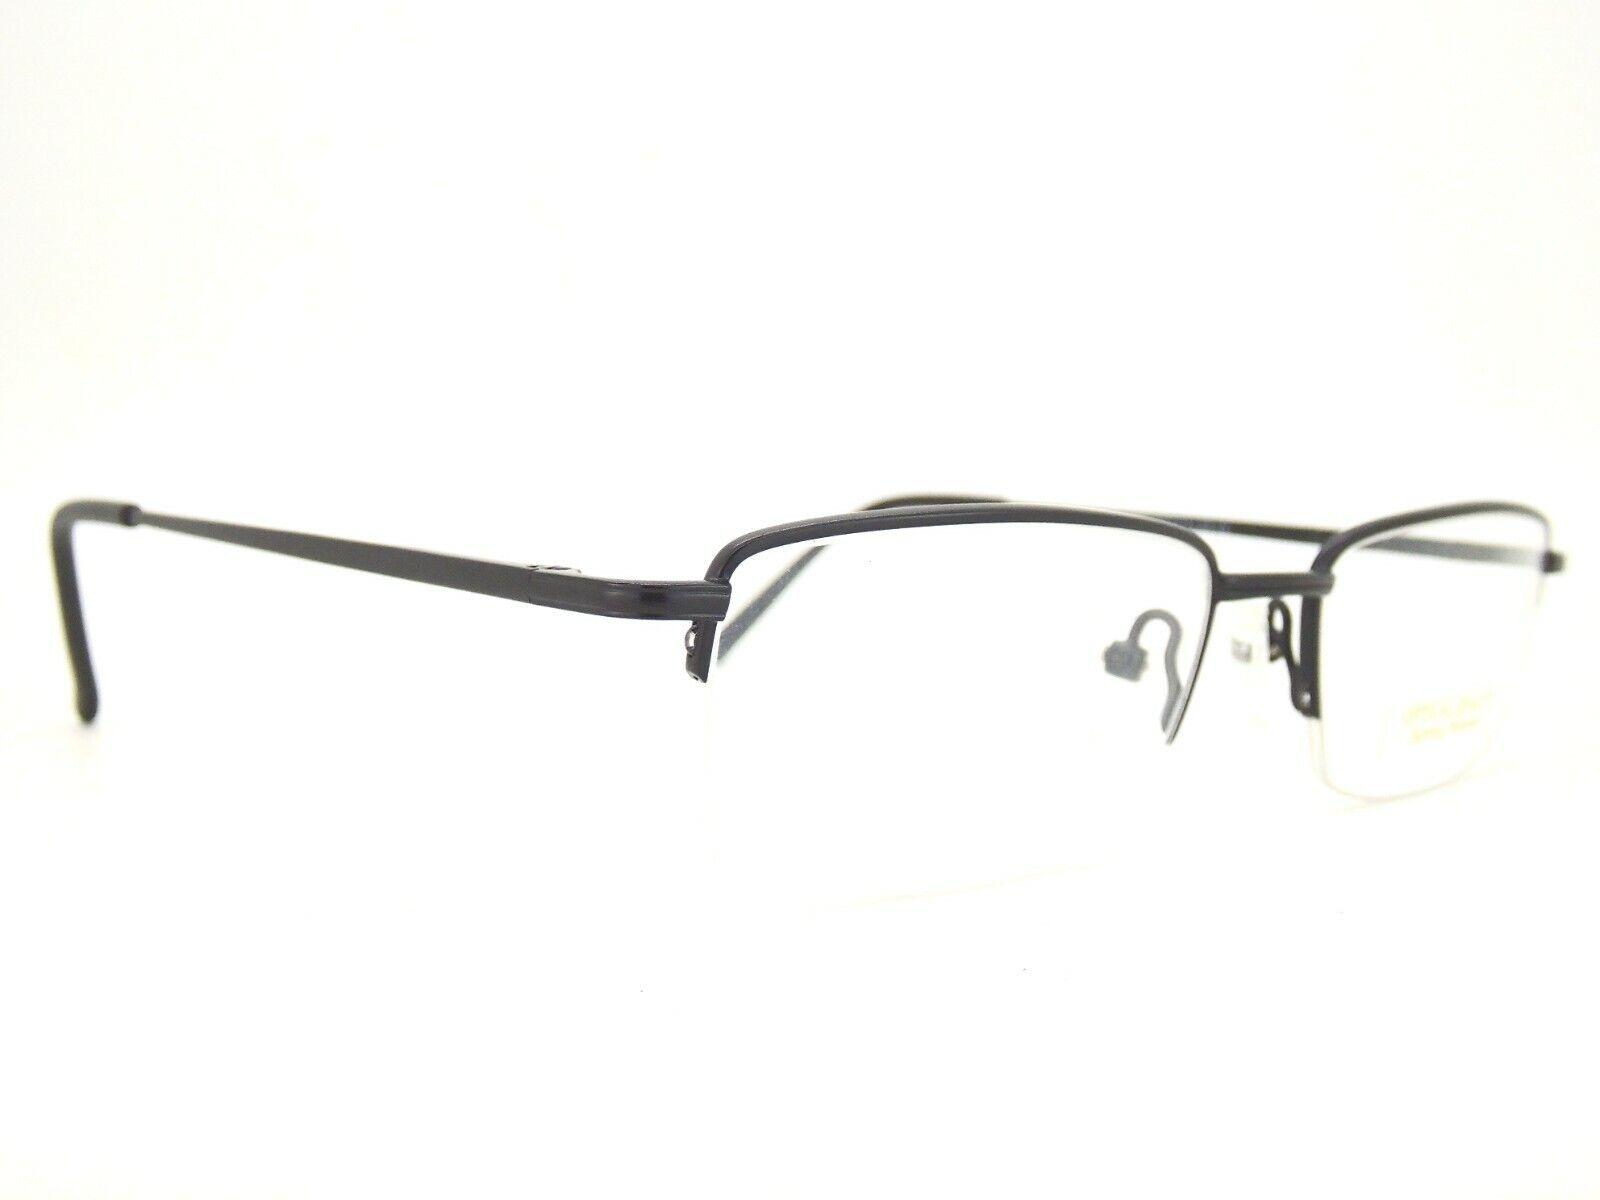 Designer Eyeglasses Brille Halbrand Federbügel goggles glasses SUNOPTIC 180 NEU